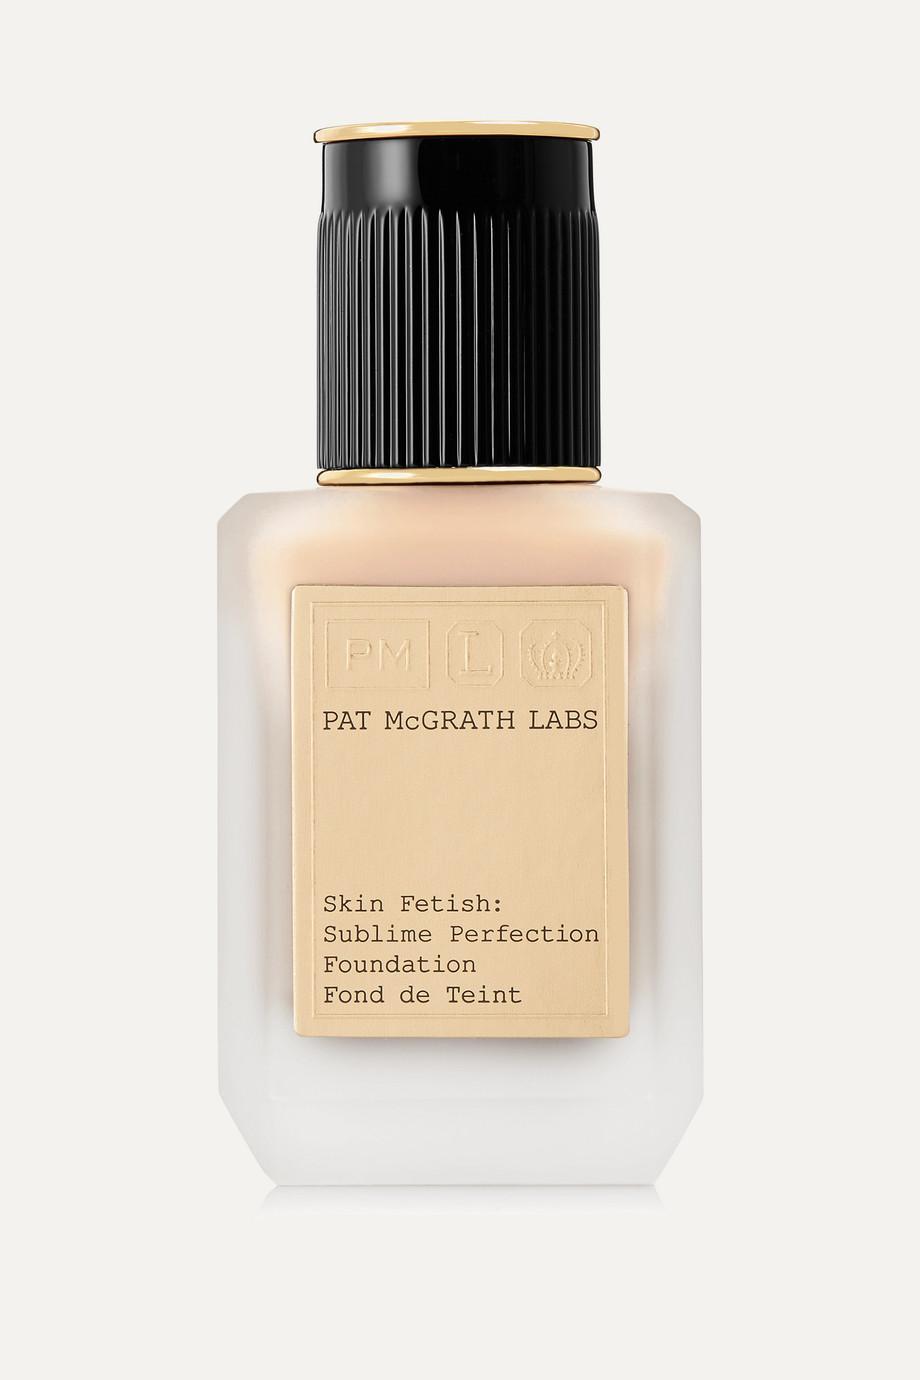 Pat McGrath Labs Skin Fetish: Sublime Perfection Foundation - Light 1, 35ml